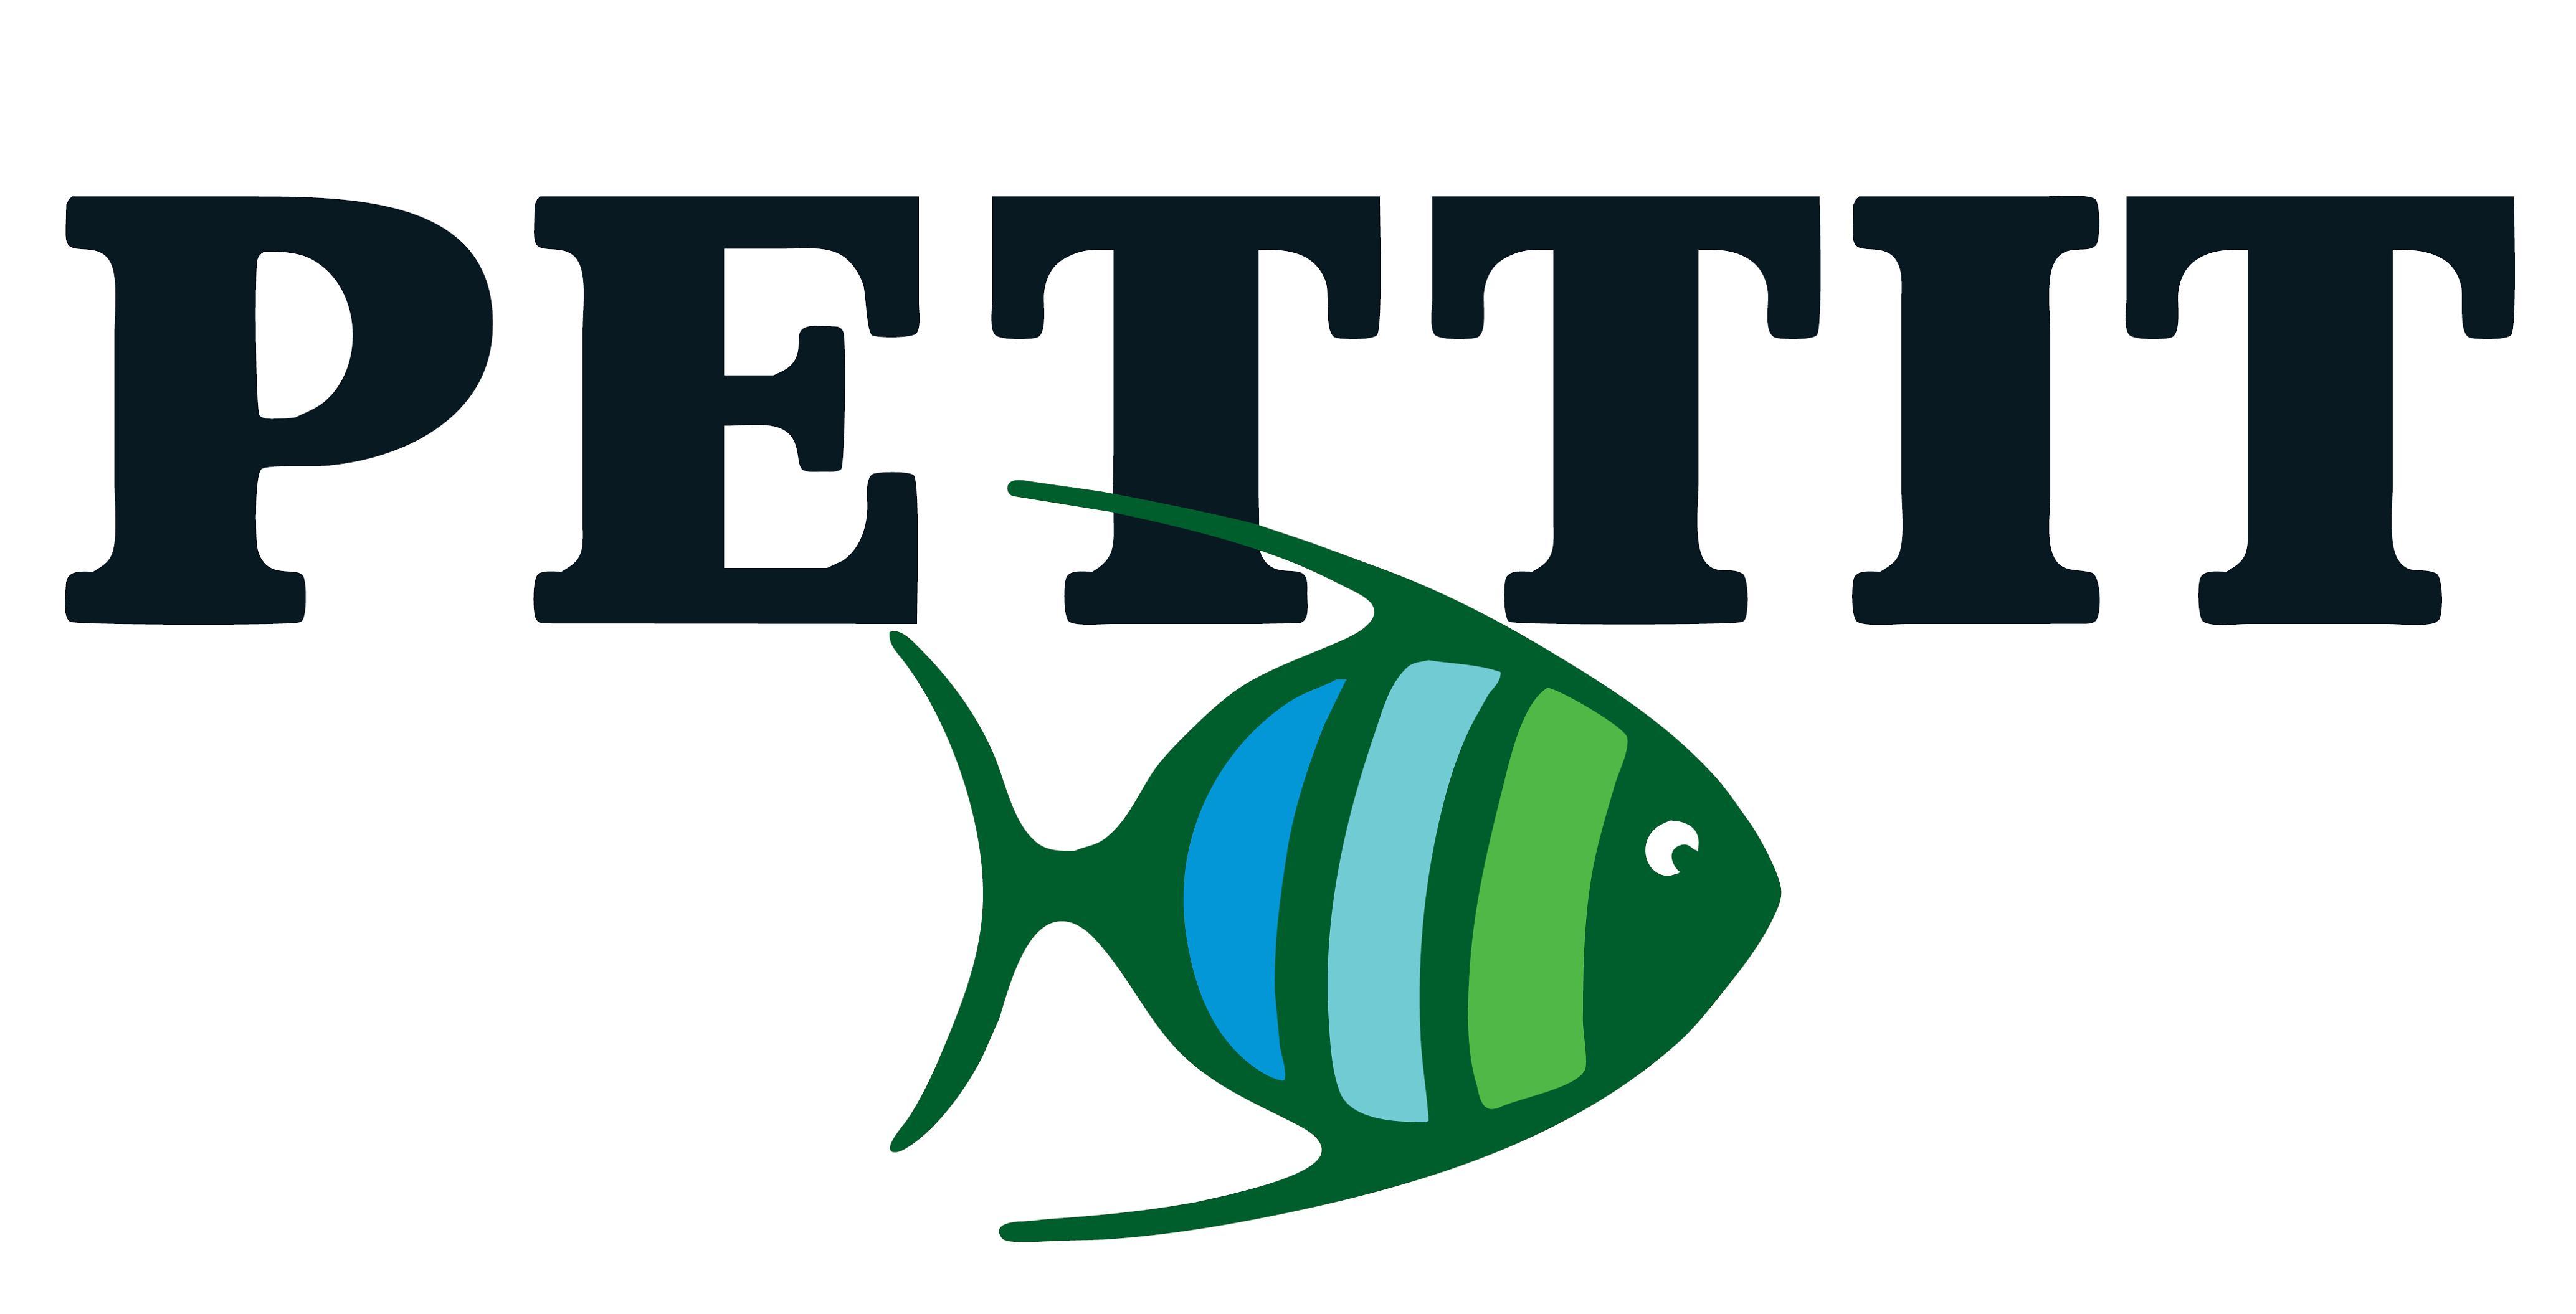 Pettit Link